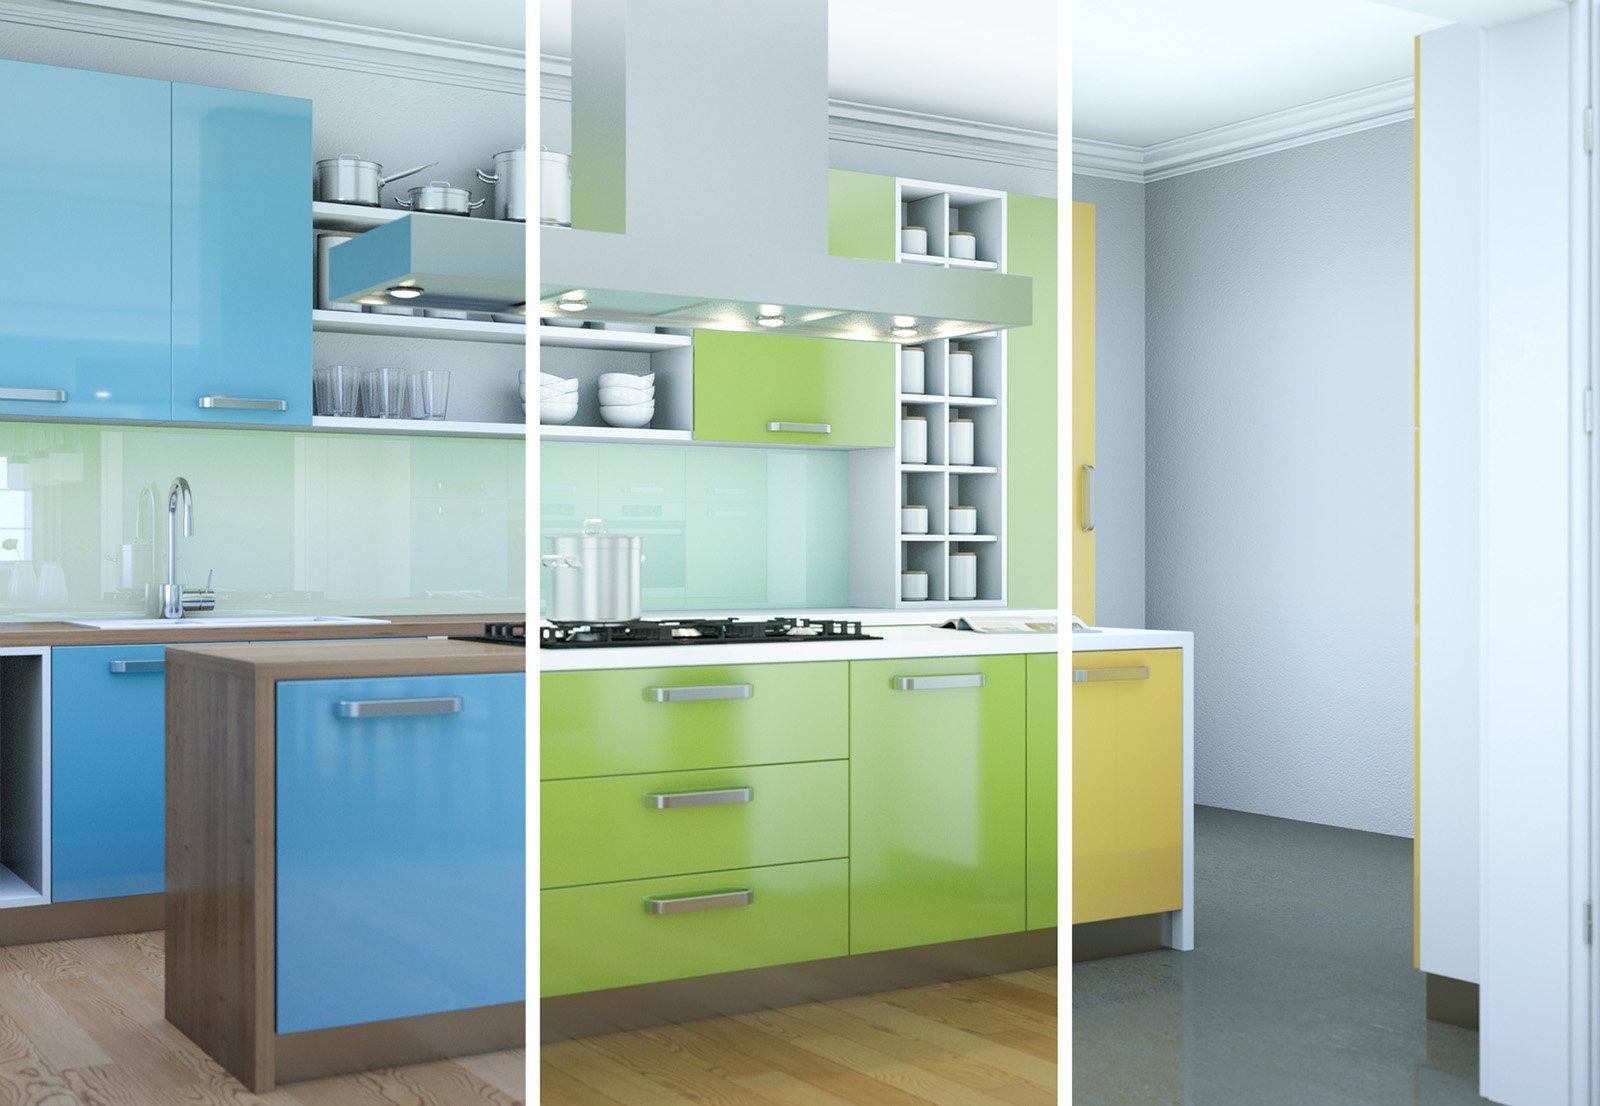 Dipingere mobili cucina xn68 regardsdefemmes - Verniciare la cucina ...